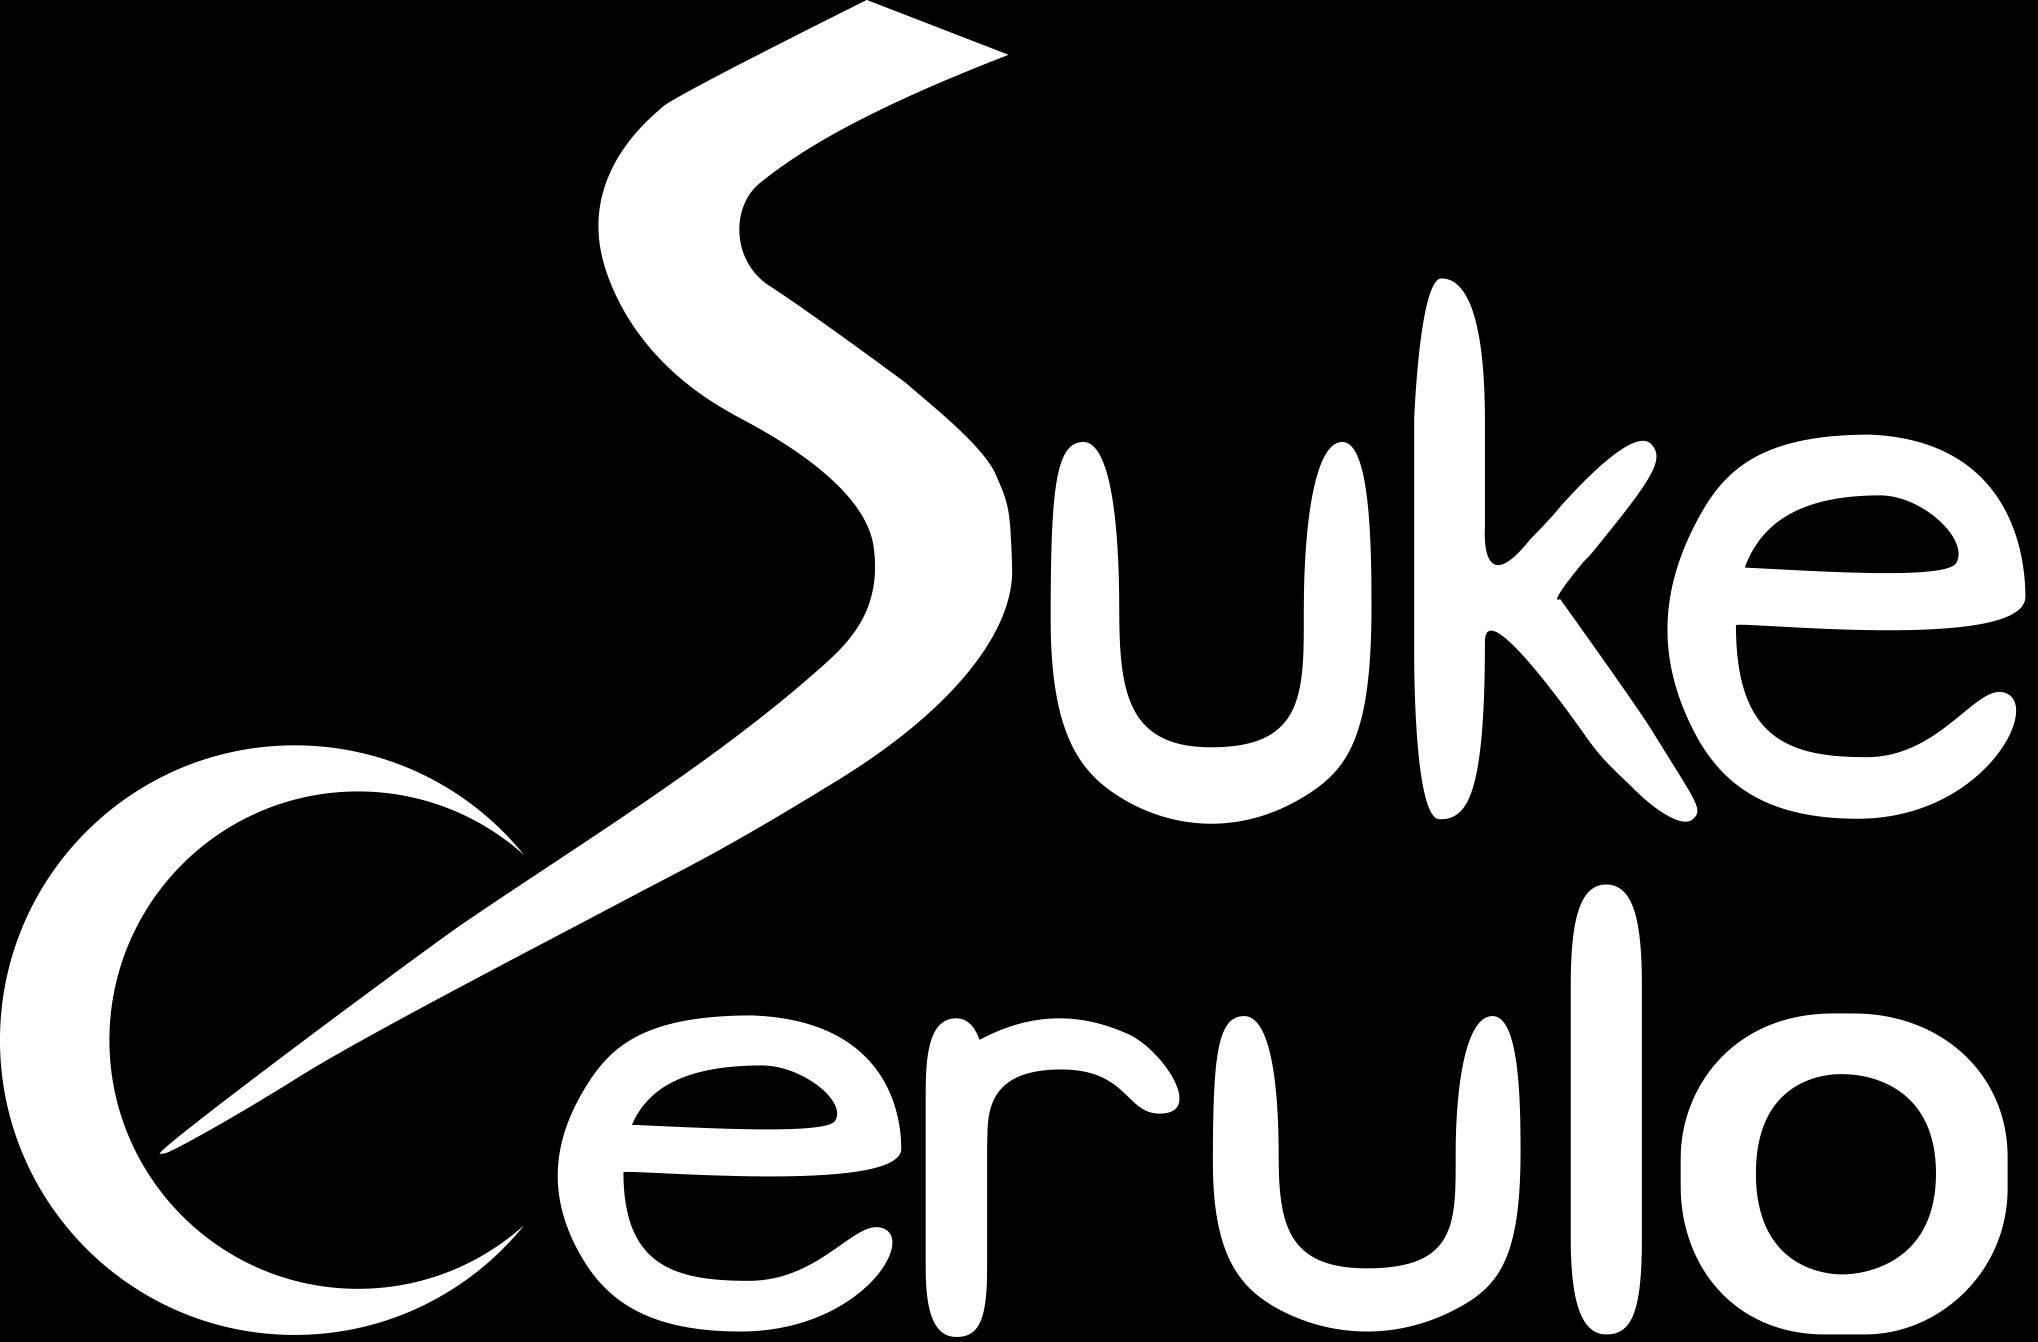 Suke Cerulo